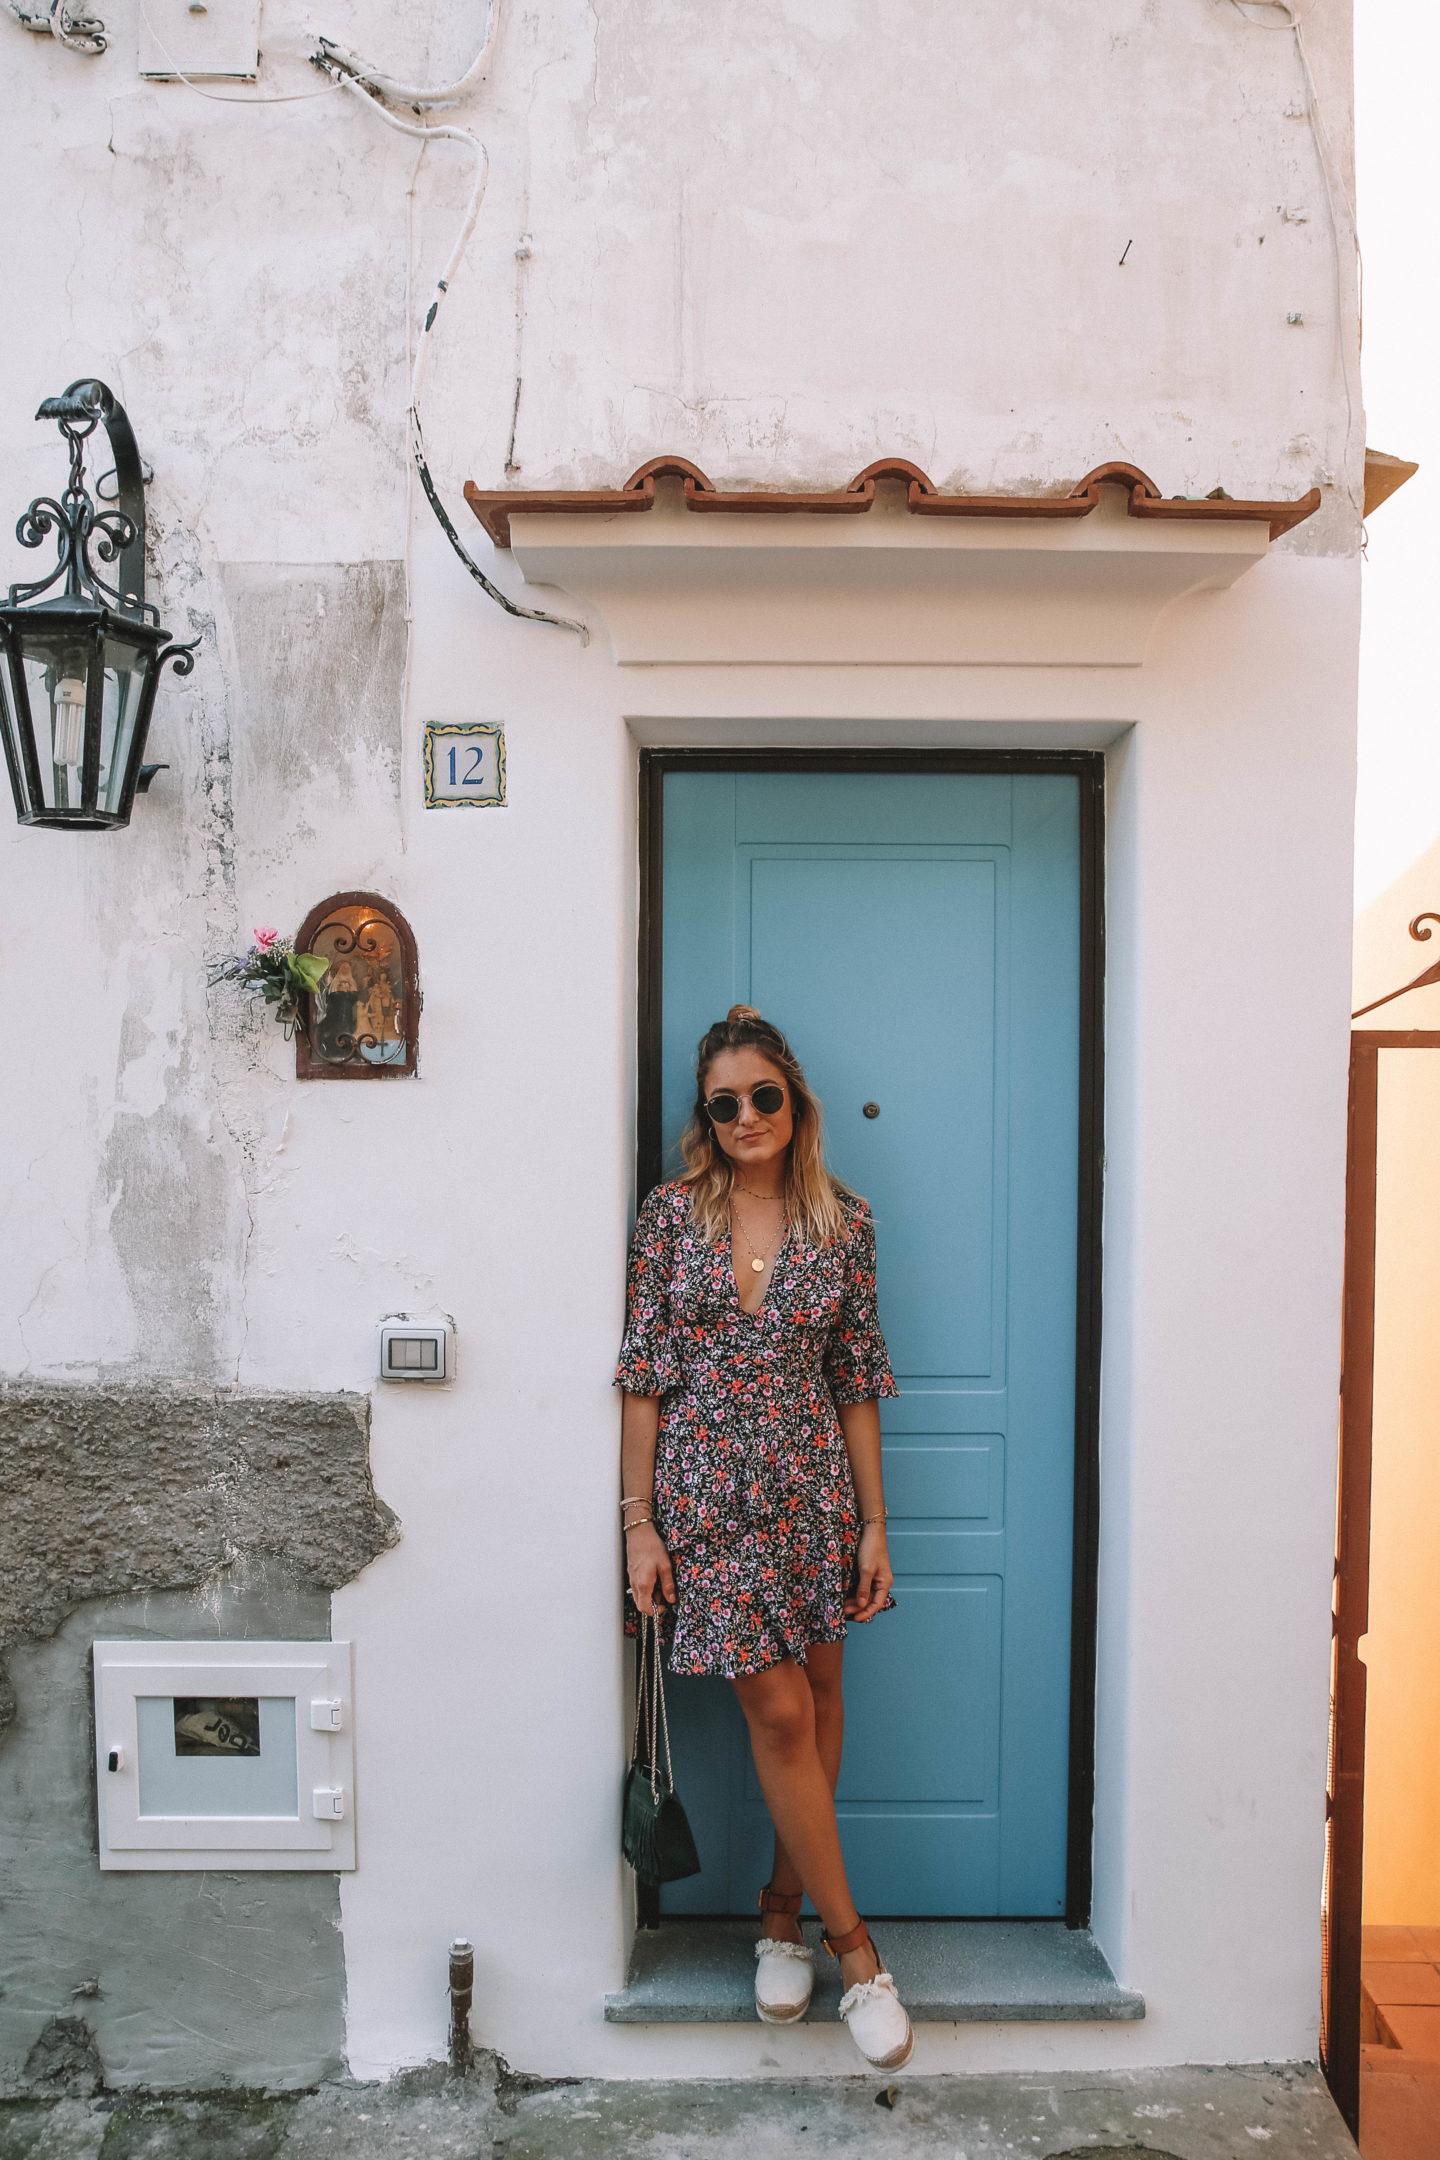 Robe à fleurs - Blondie baby blog mode et voyages